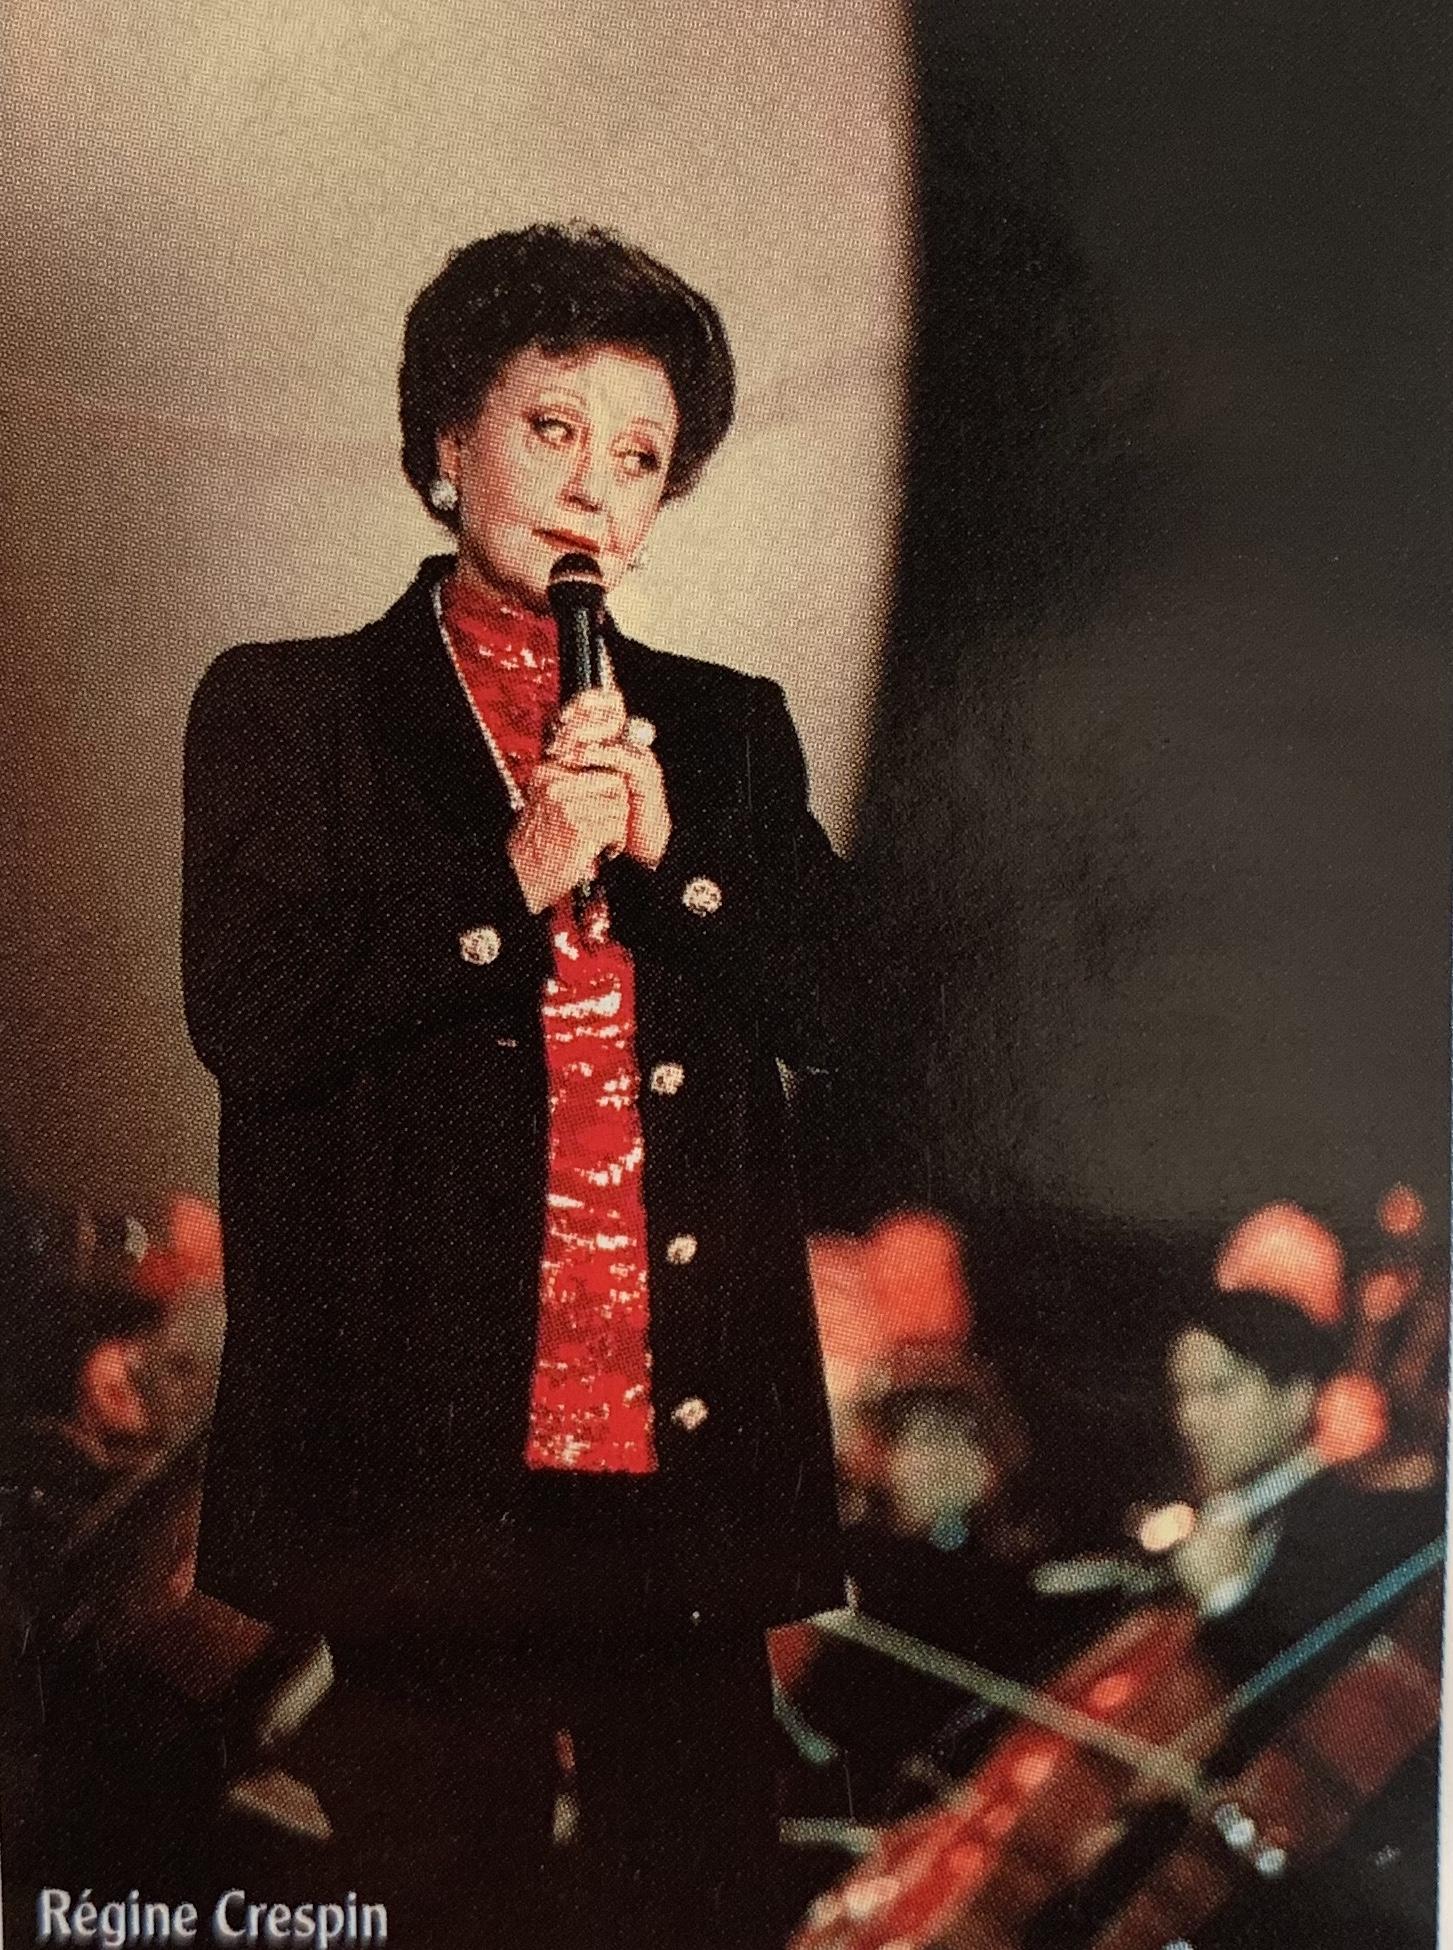 Victoires de la Musique Classique - regine Crespin